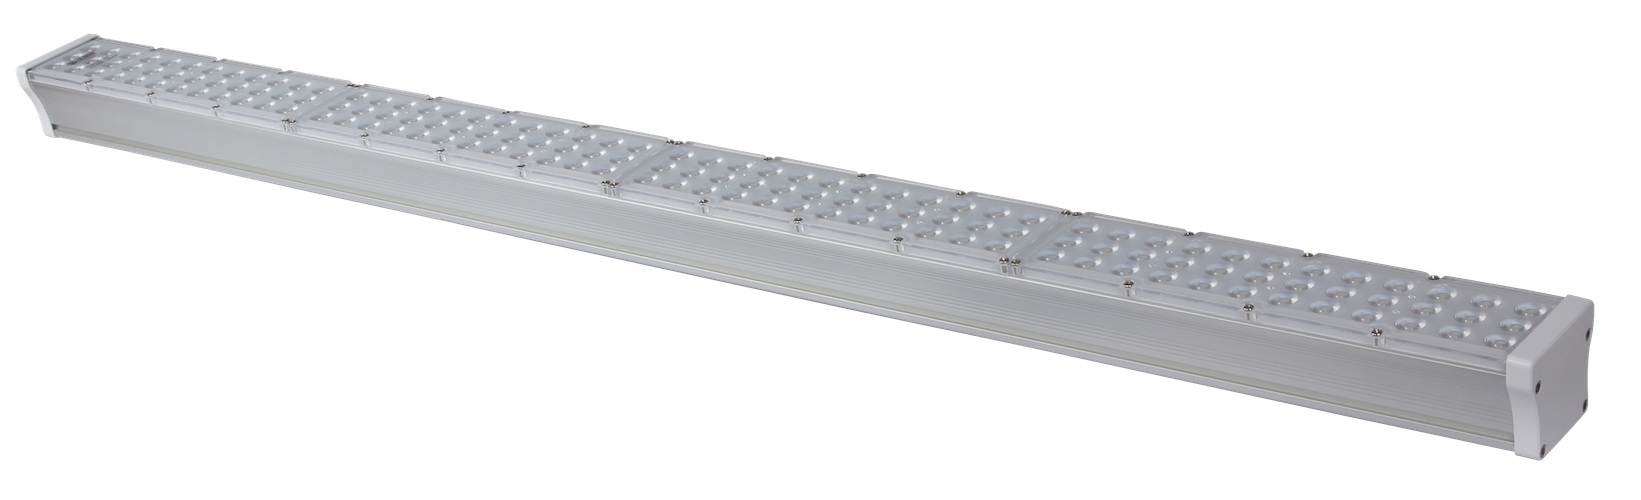 60w LED Linear light